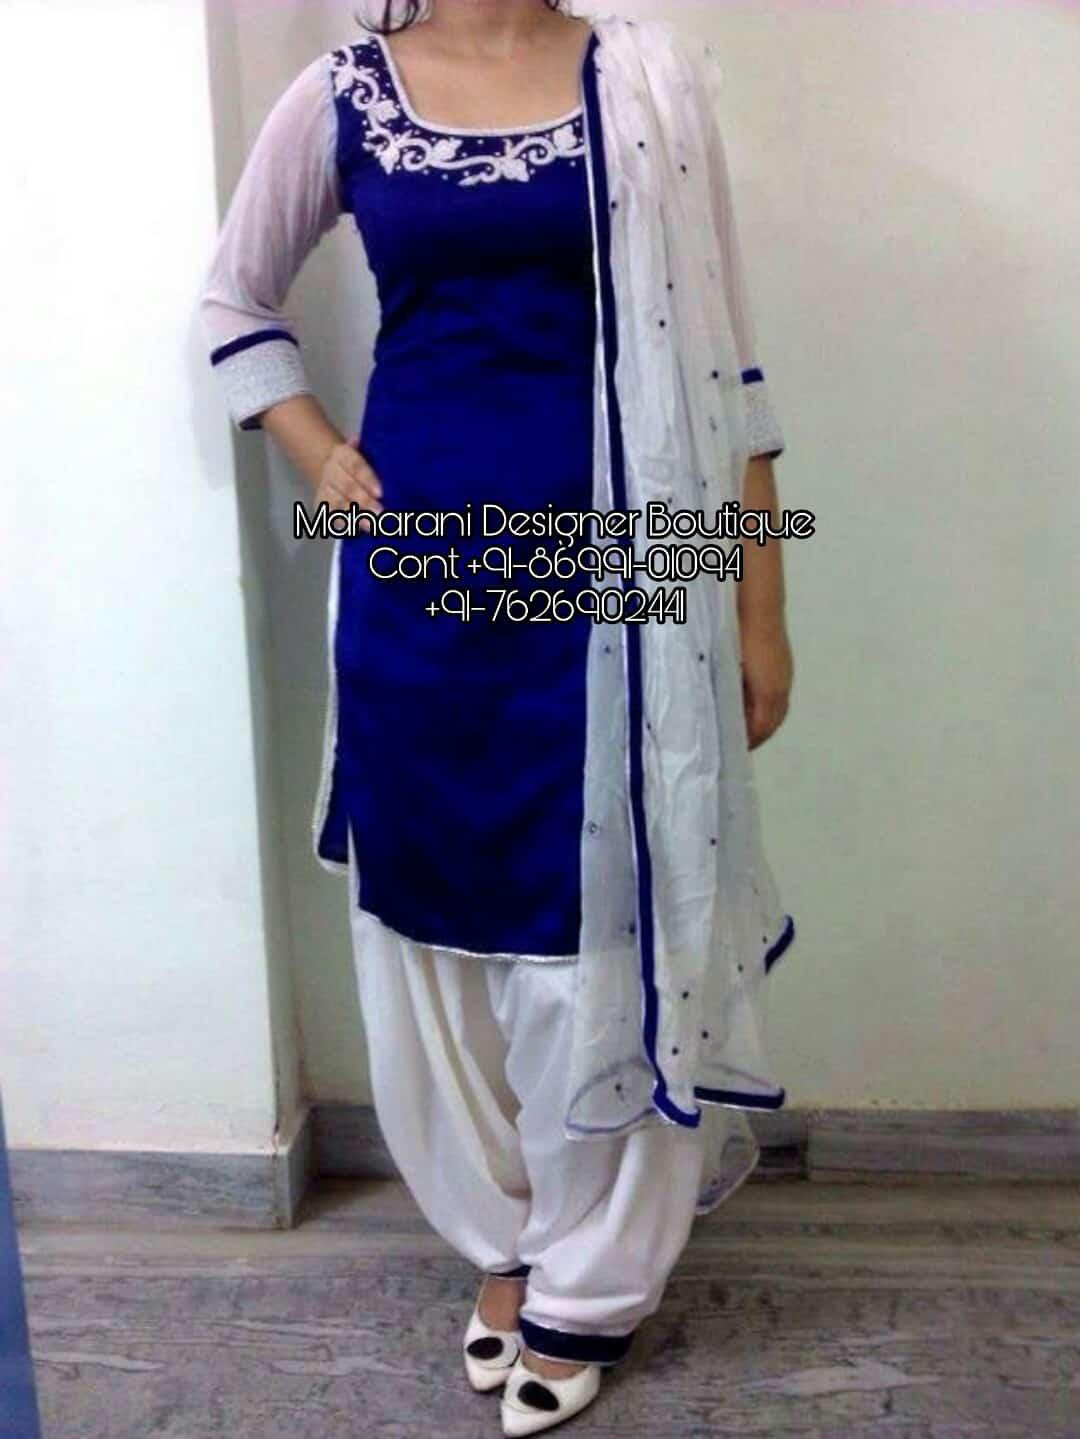 cc925c9c5 Designer Patiala Salwar Suits Online Shopping | Maharani Designer Boutique